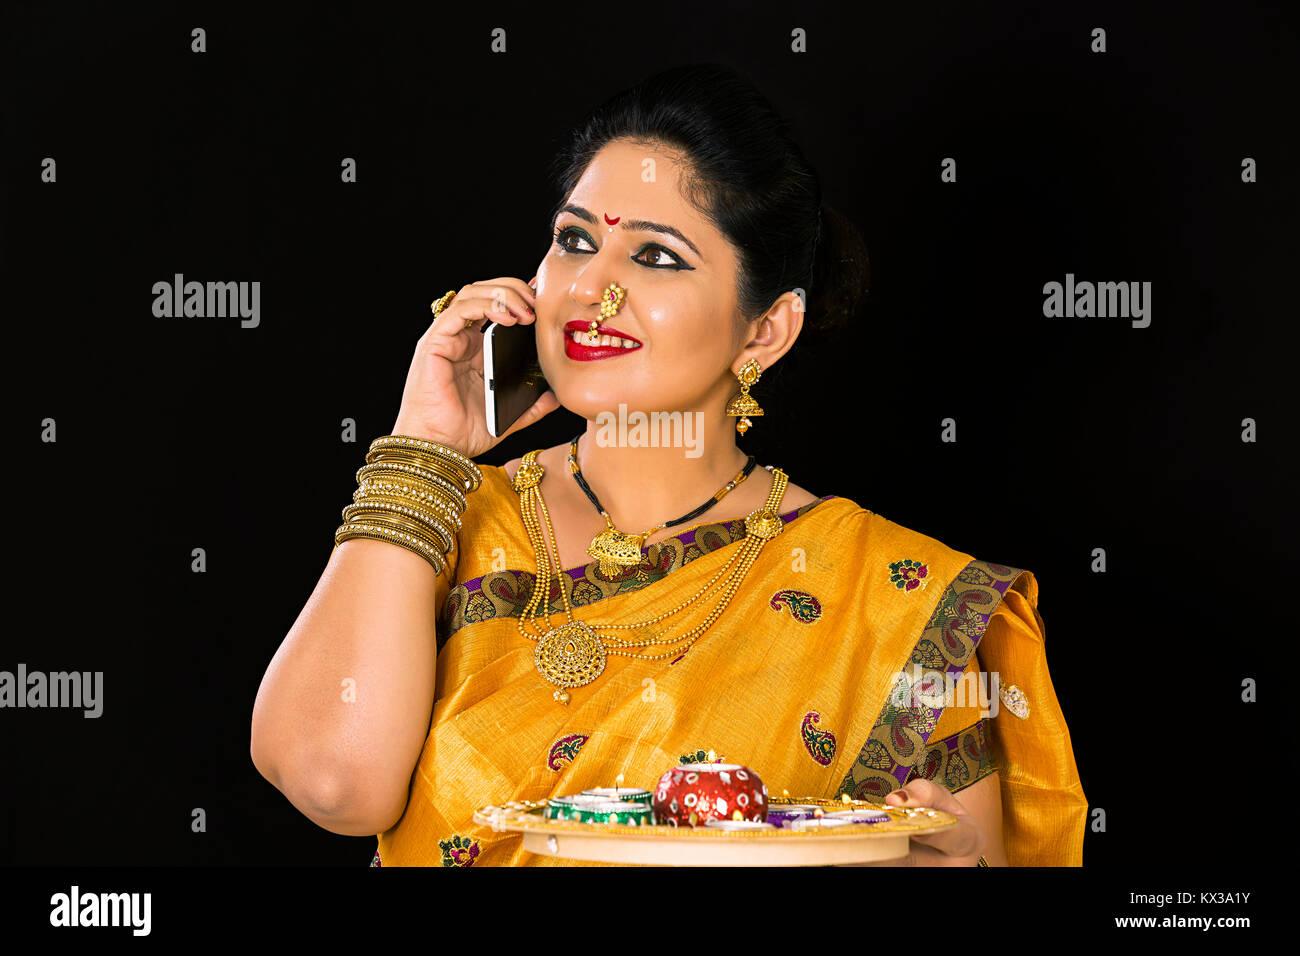 Indian Marathi Woman Deepawali Festival Talking Phone Smiling - Stock Image